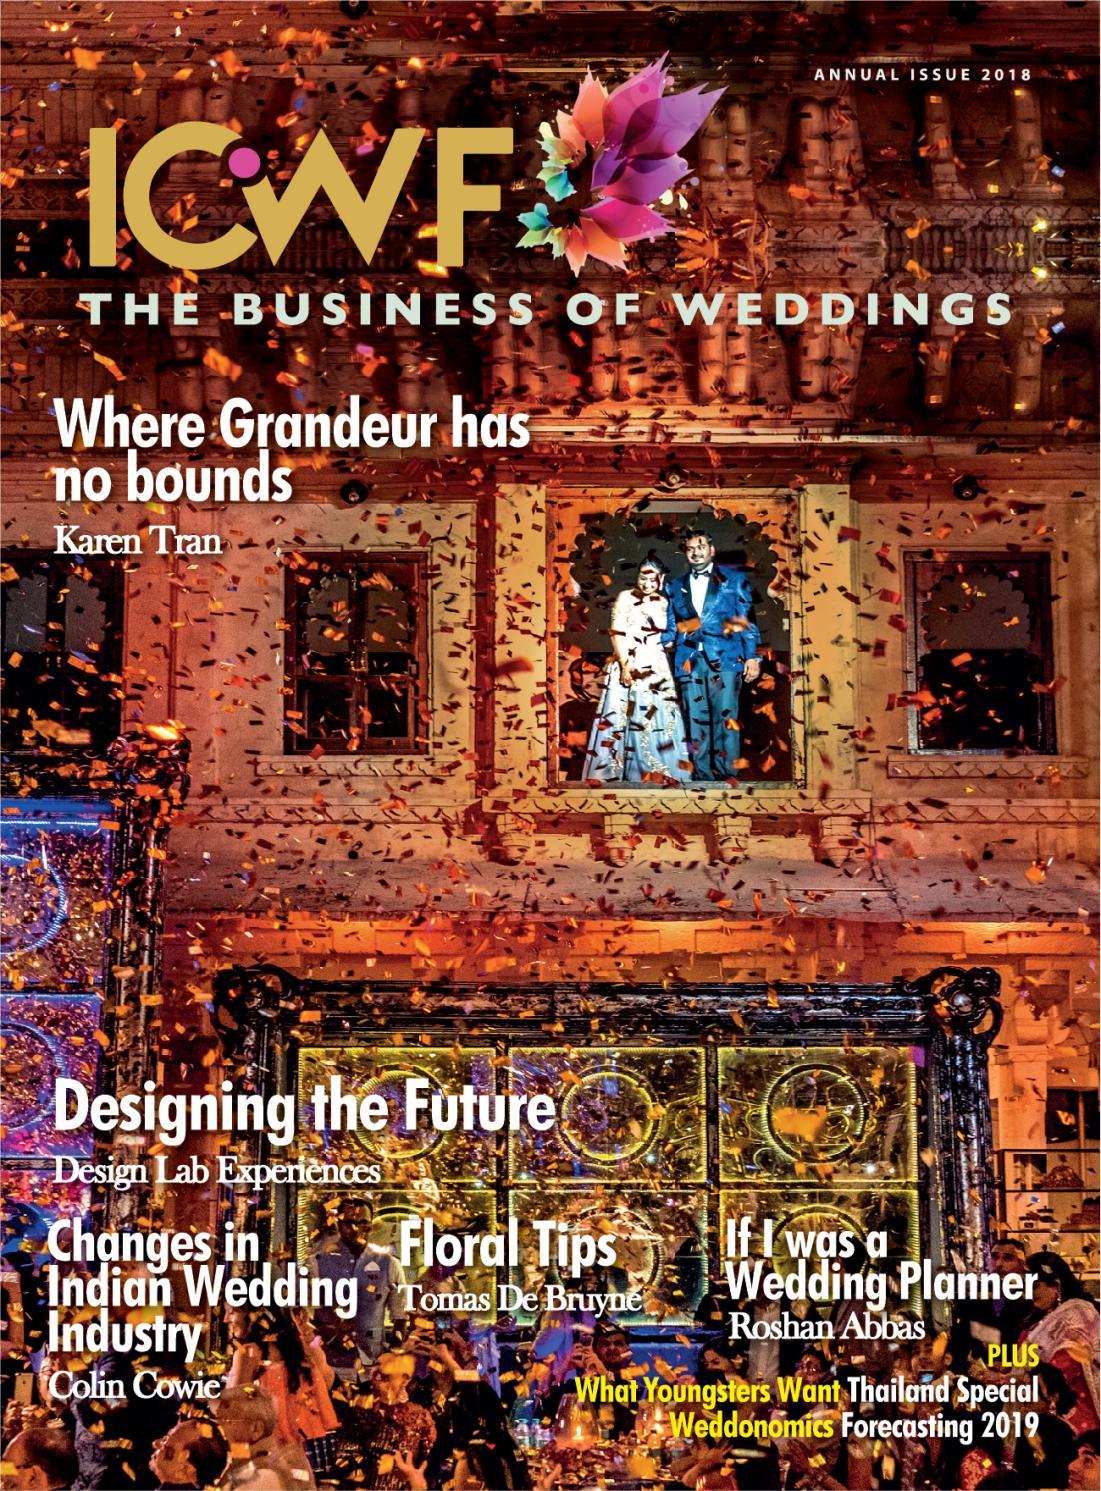 Icwf The Business Of Weddings By Mandeepscontact Issuu